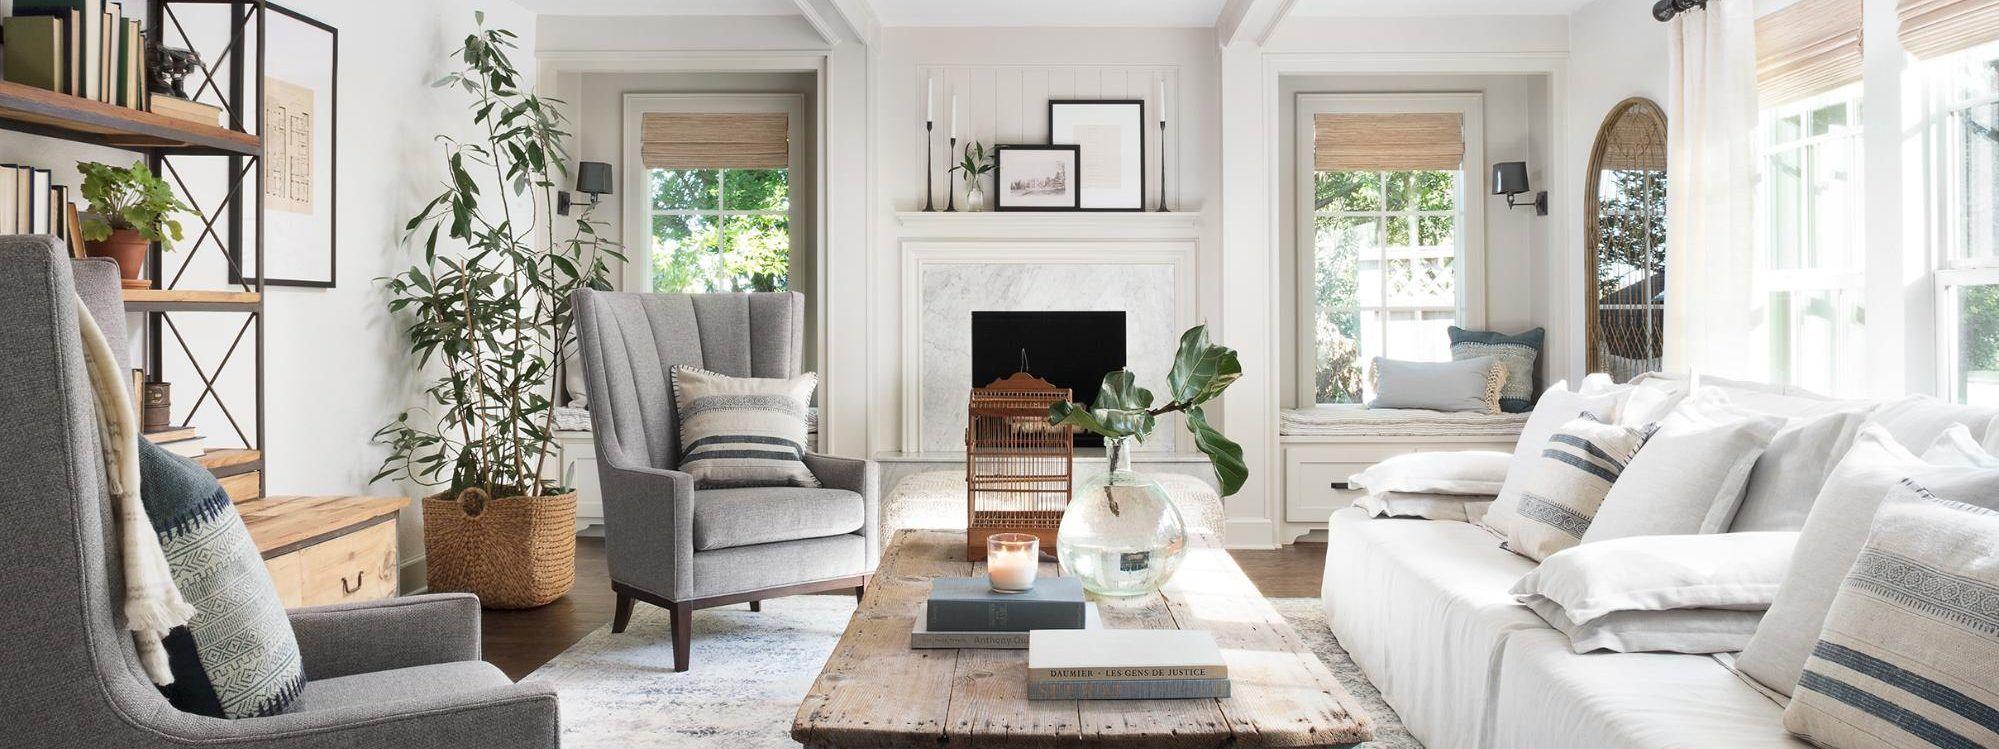 Fixer Upper design tips from Jo | Pinterest | Joanna gaines, Fixer ...